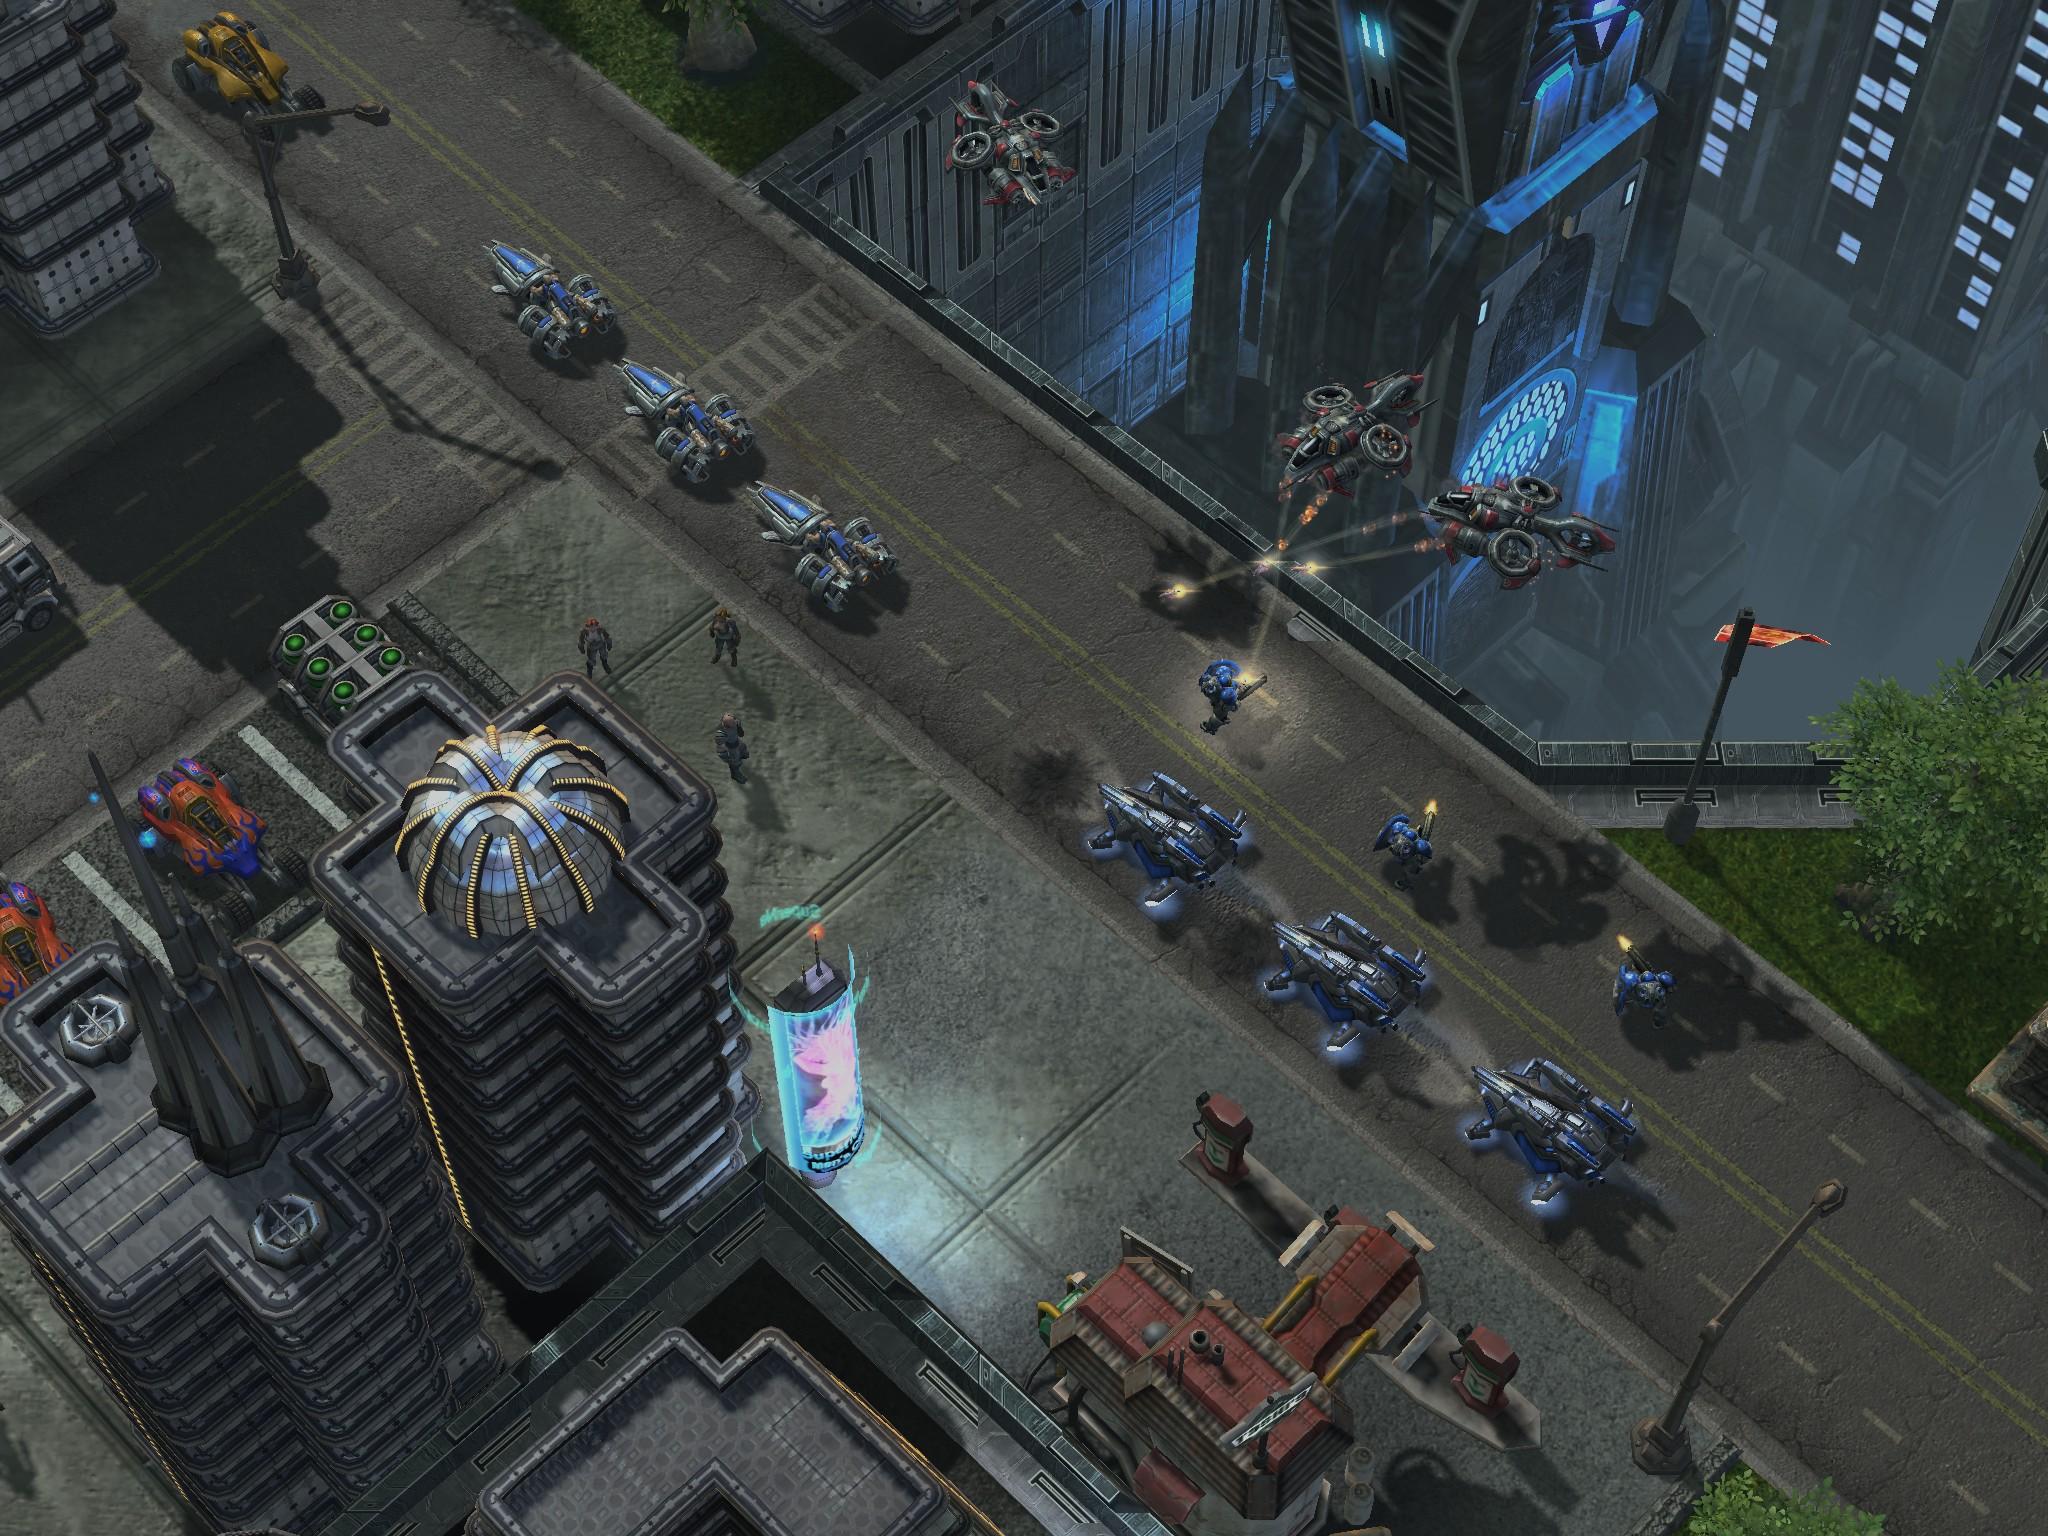 blizzcon 09《星际争霸2》新公布画面(1)_游戏新闻图片